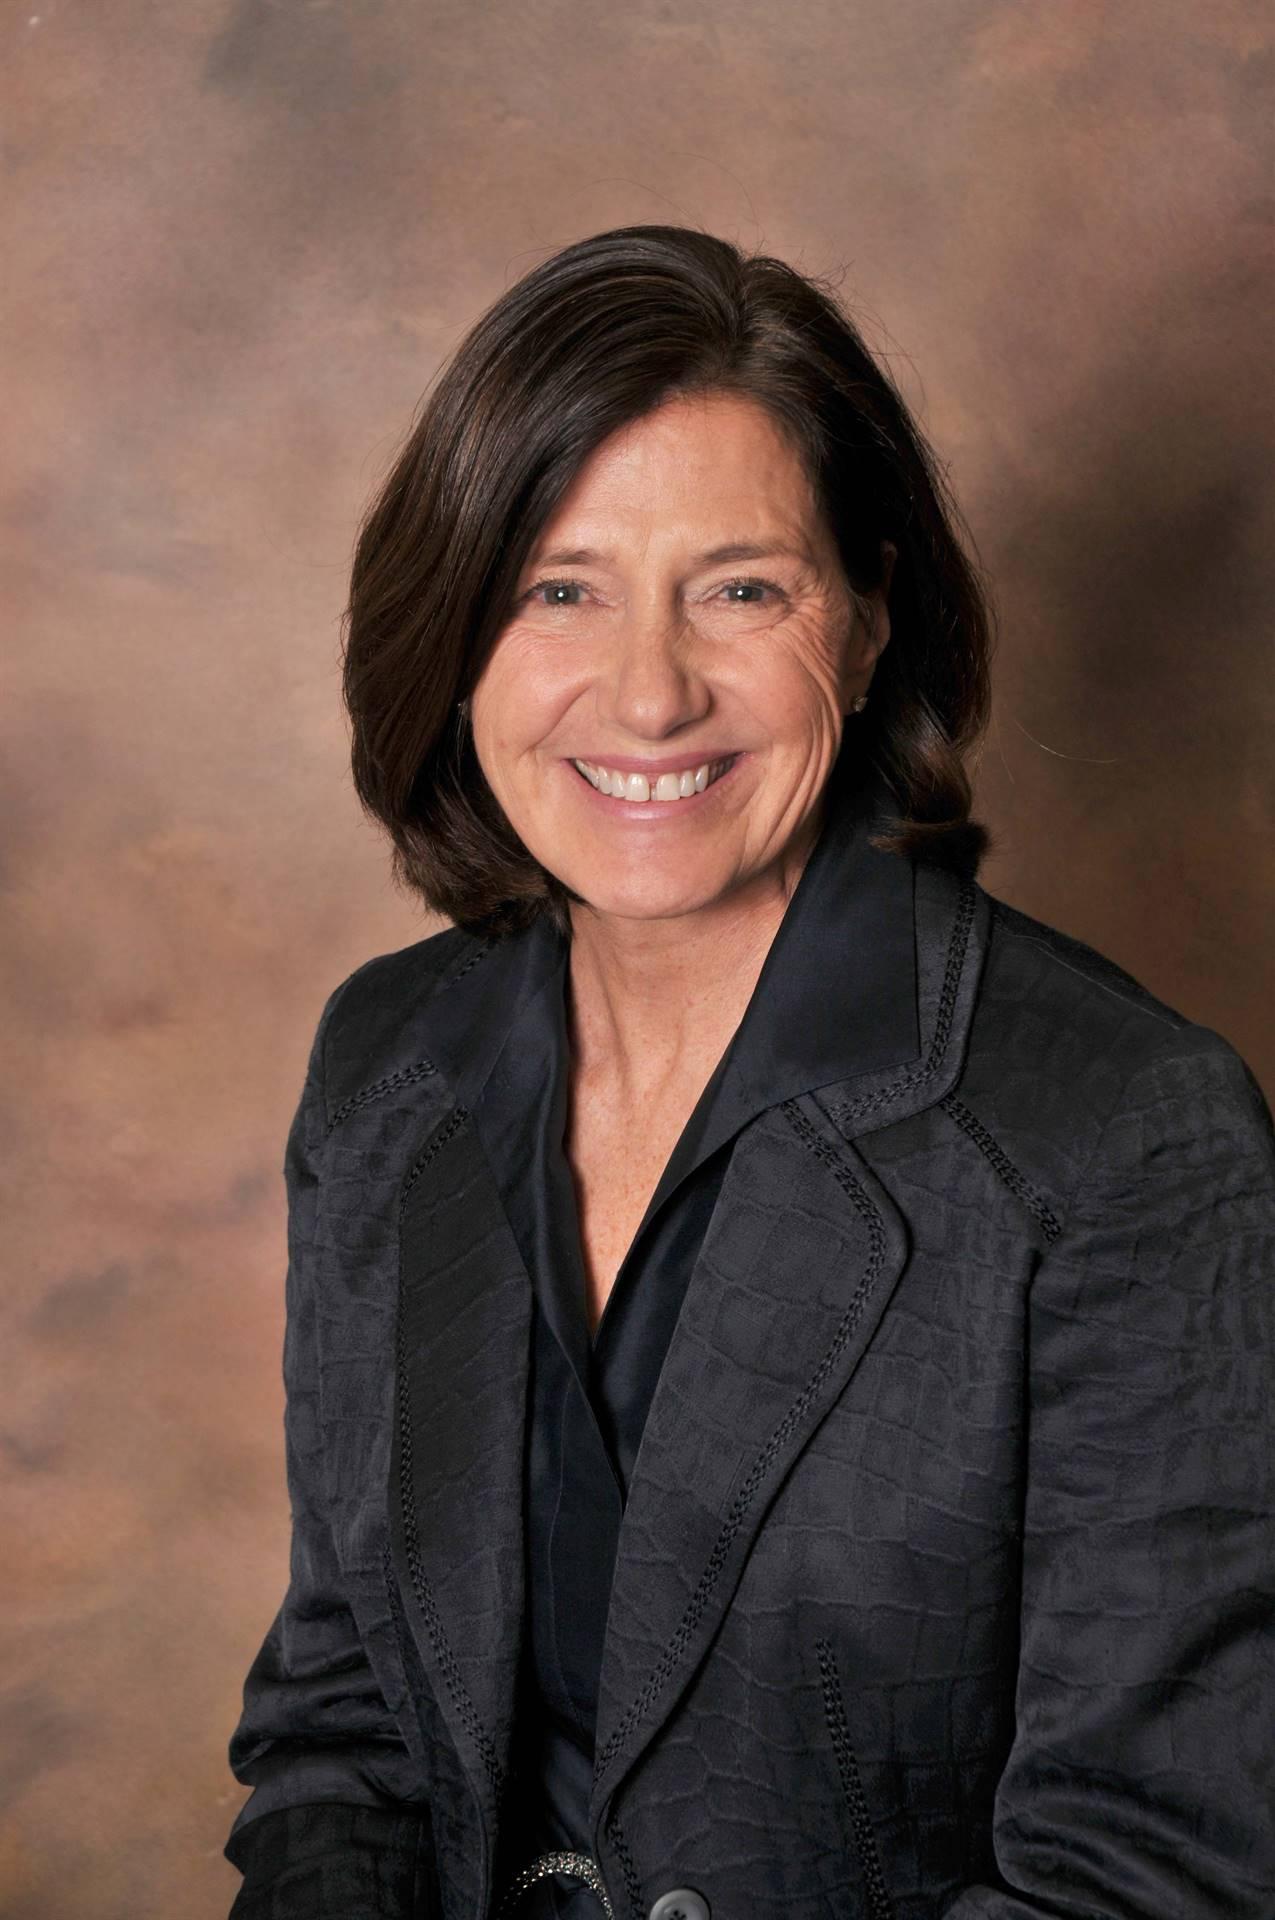 Nancy Drees, Board of Education Vice President